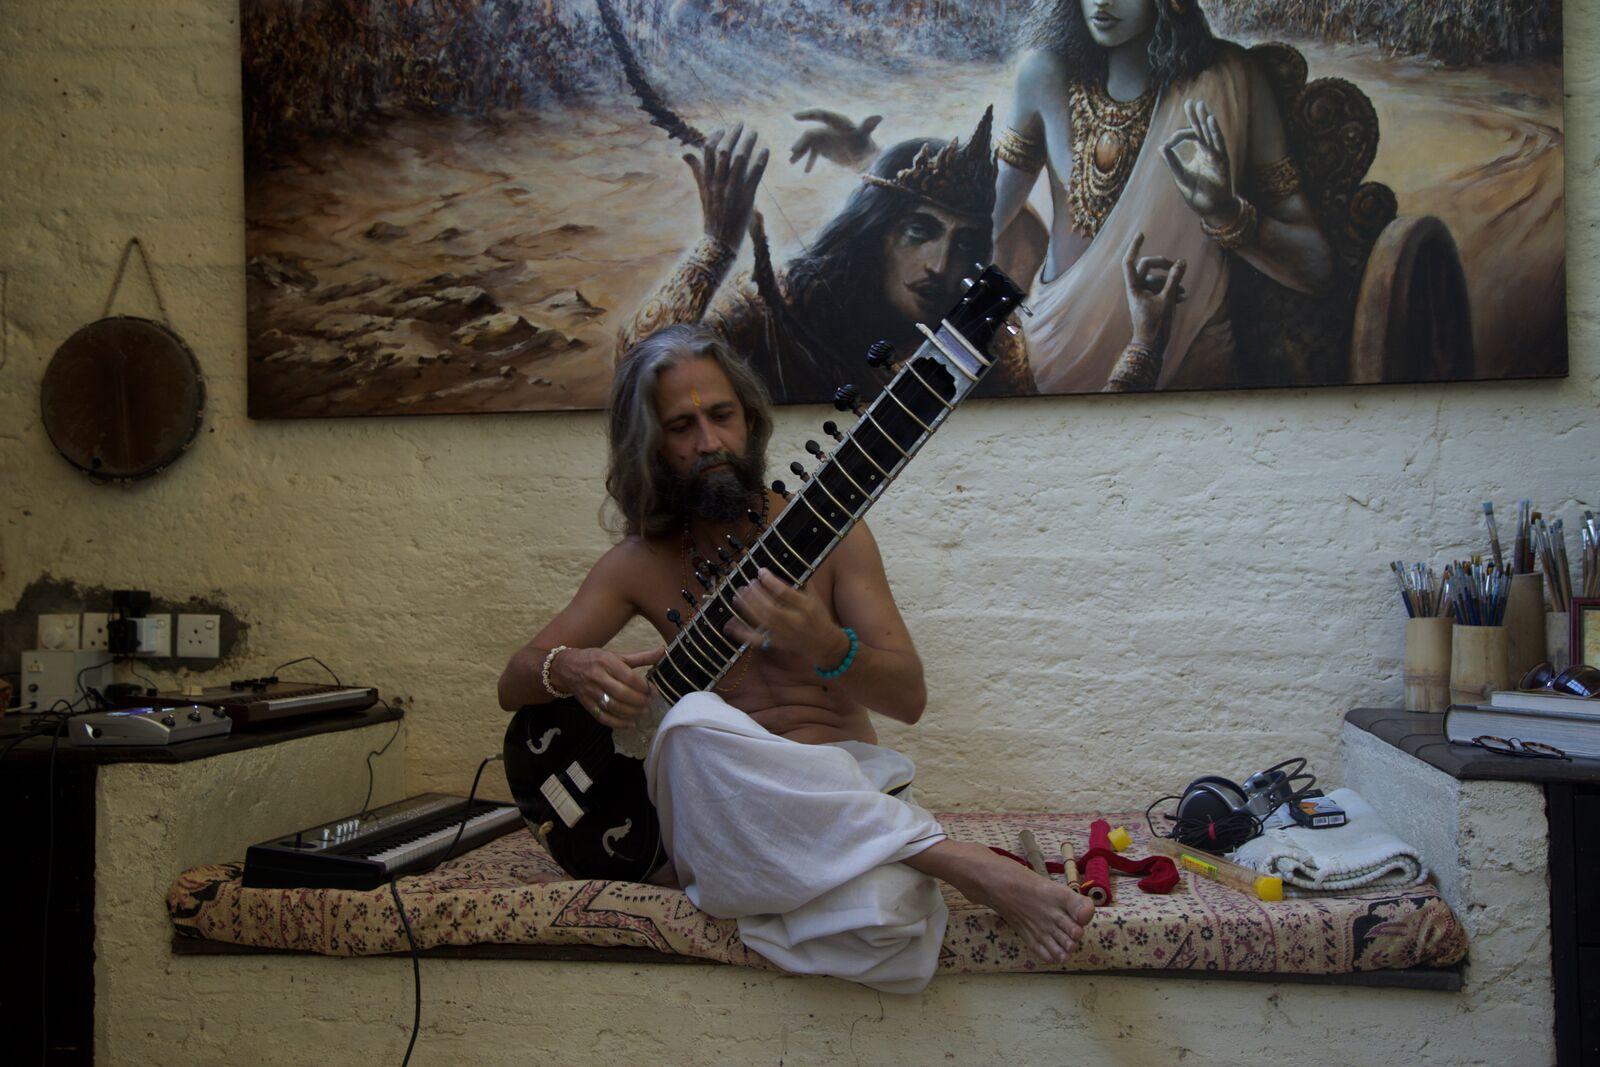 The hermit painter strumming on his sitar in Kandy, Sri Lanka. Photo credit : Dilshad Sadiq